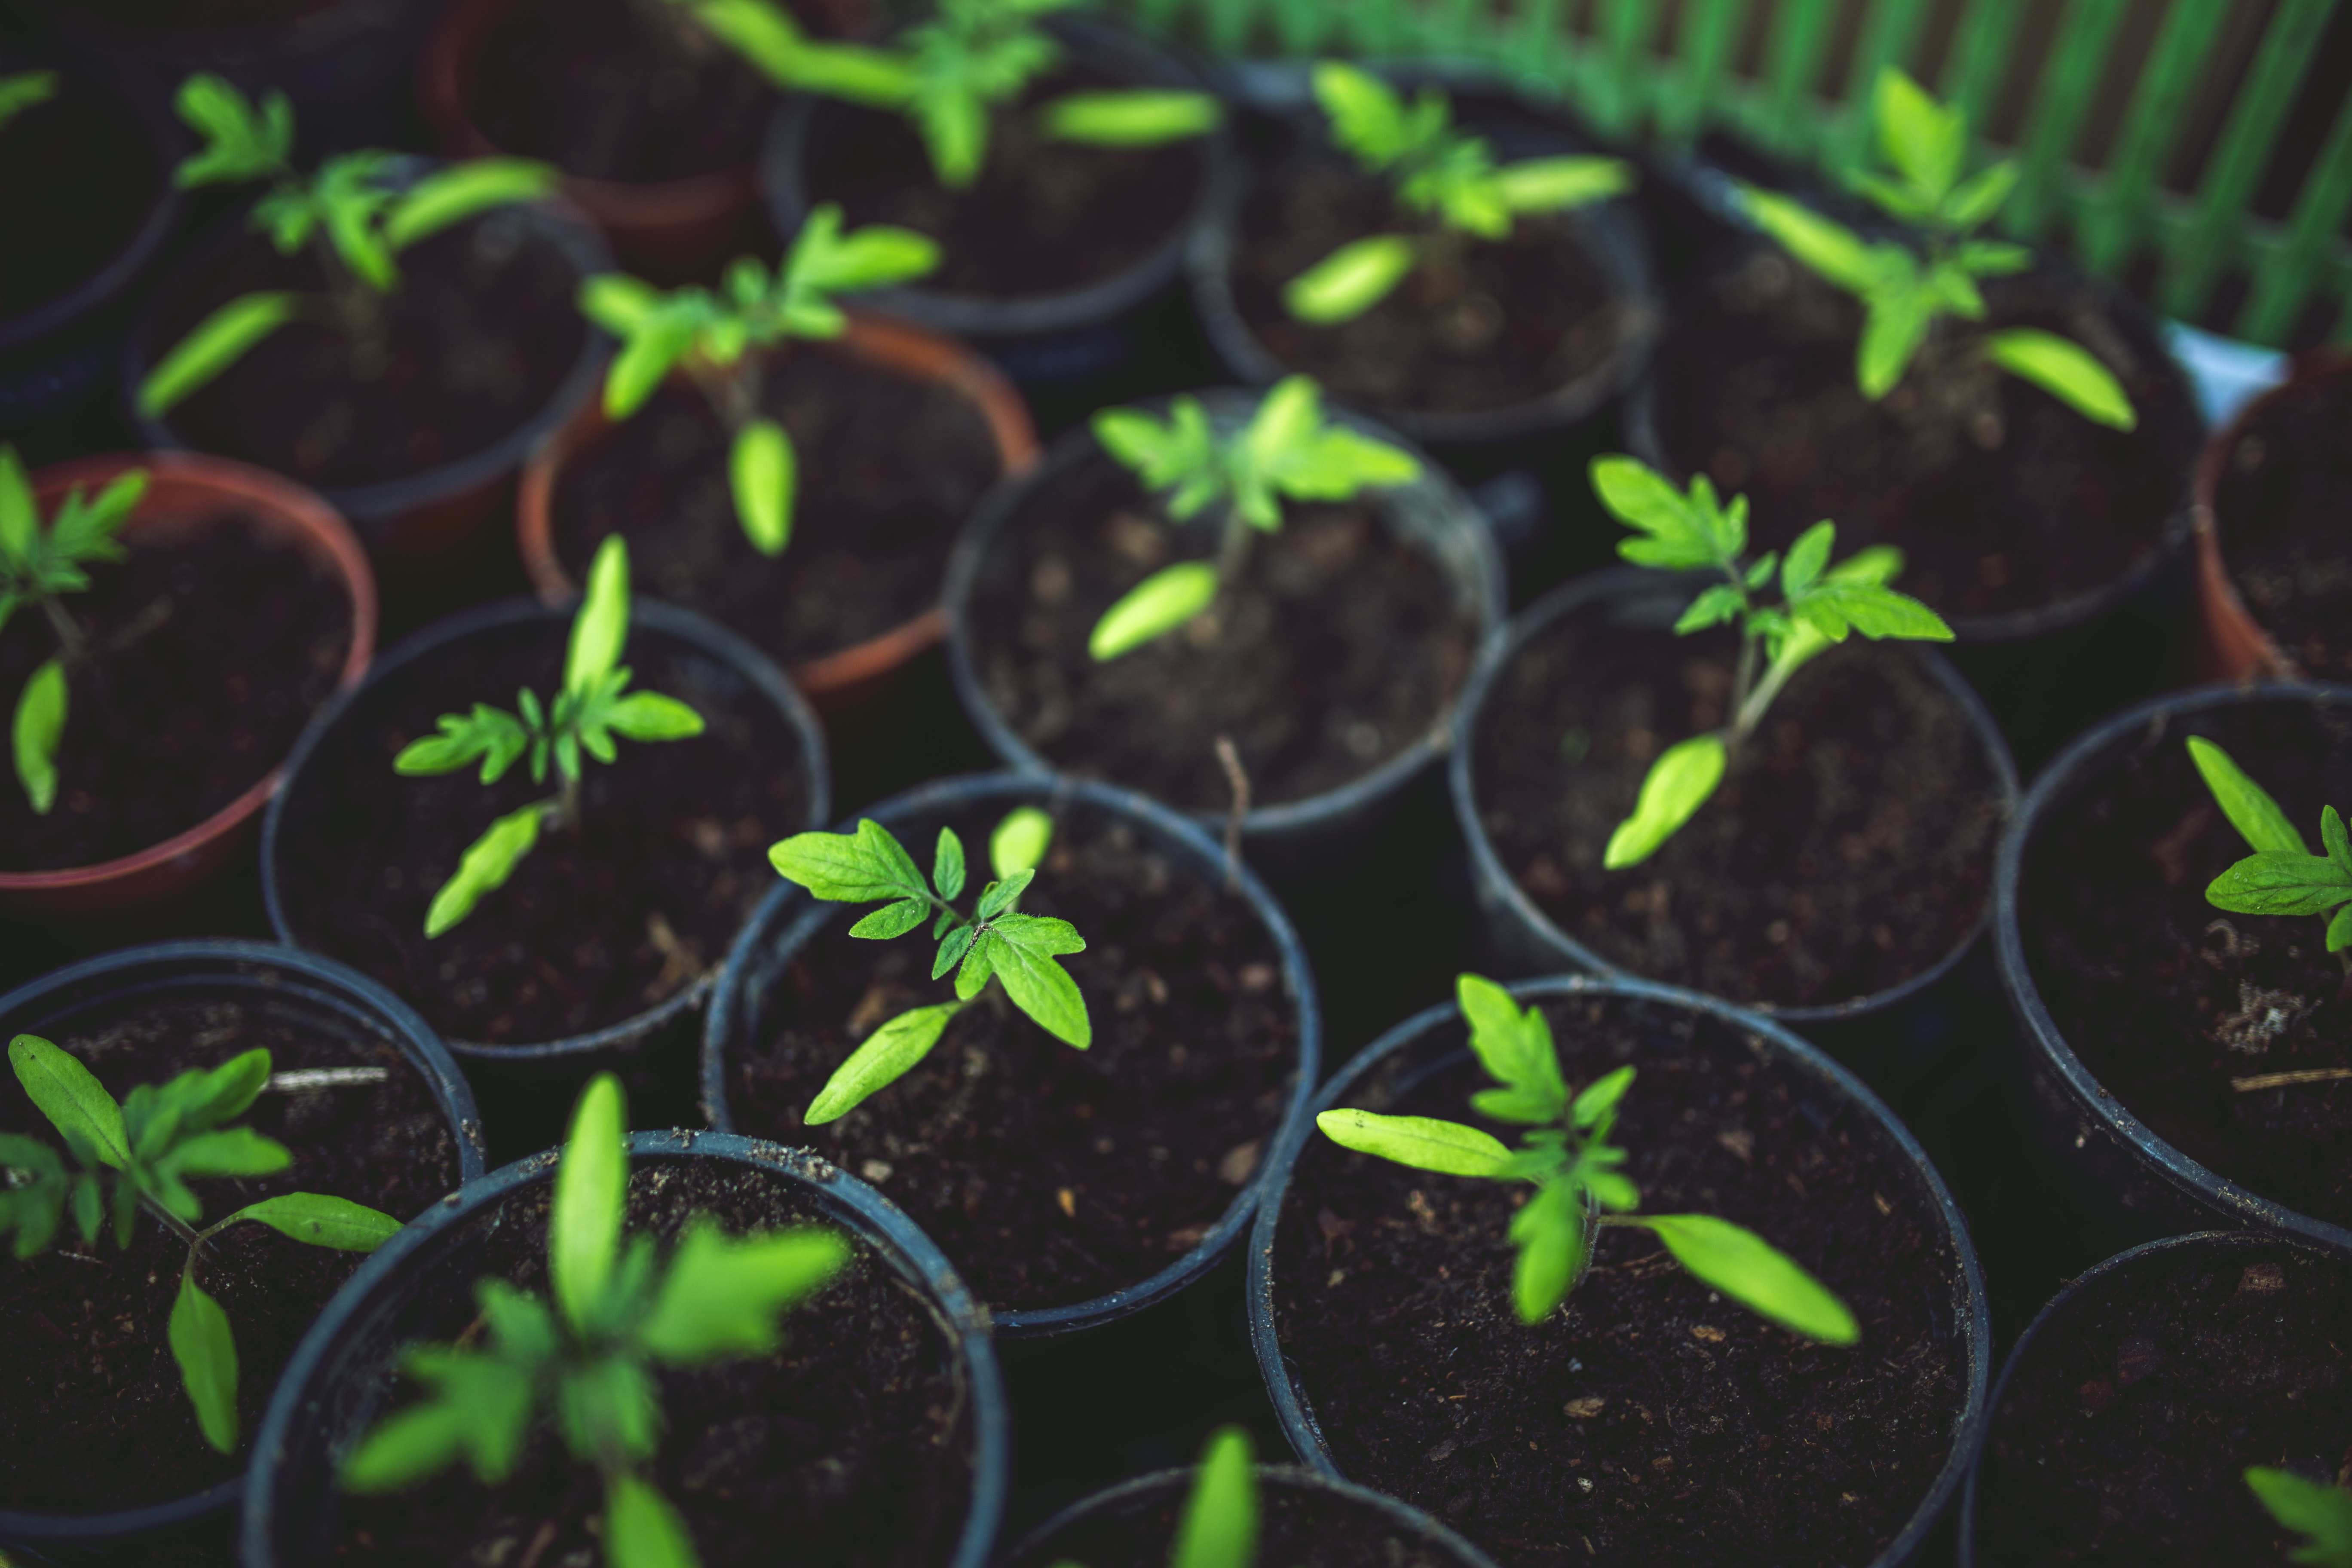 CRISPR-edited Plants and Regulation